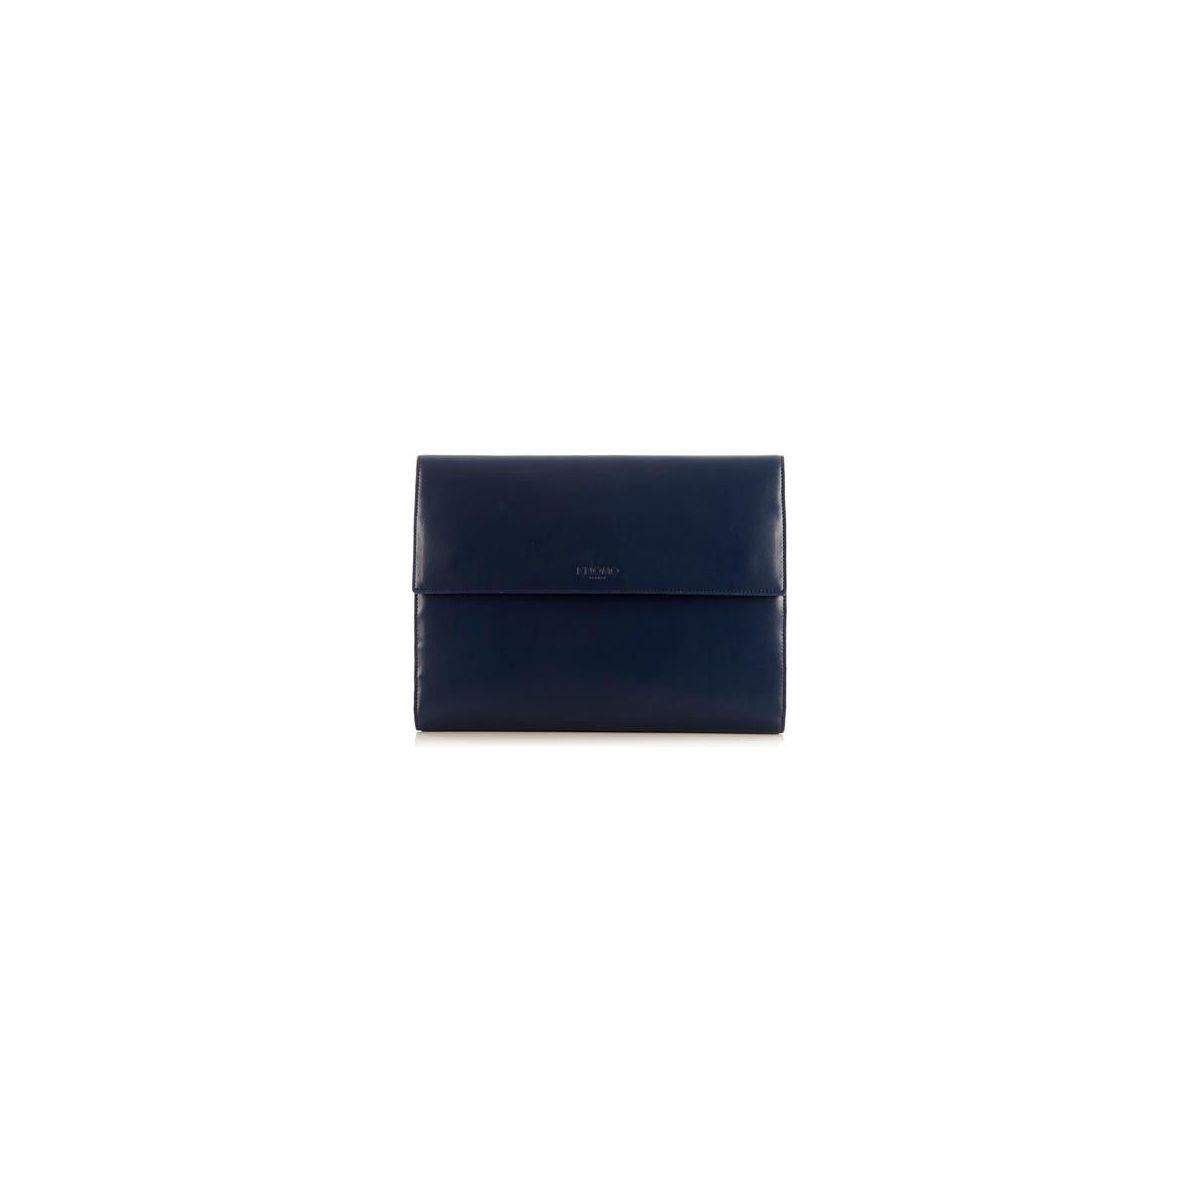 Folio knomo knomad ipad air bleu - 20% de remise imm�diate avec le code : priv20 (photo)